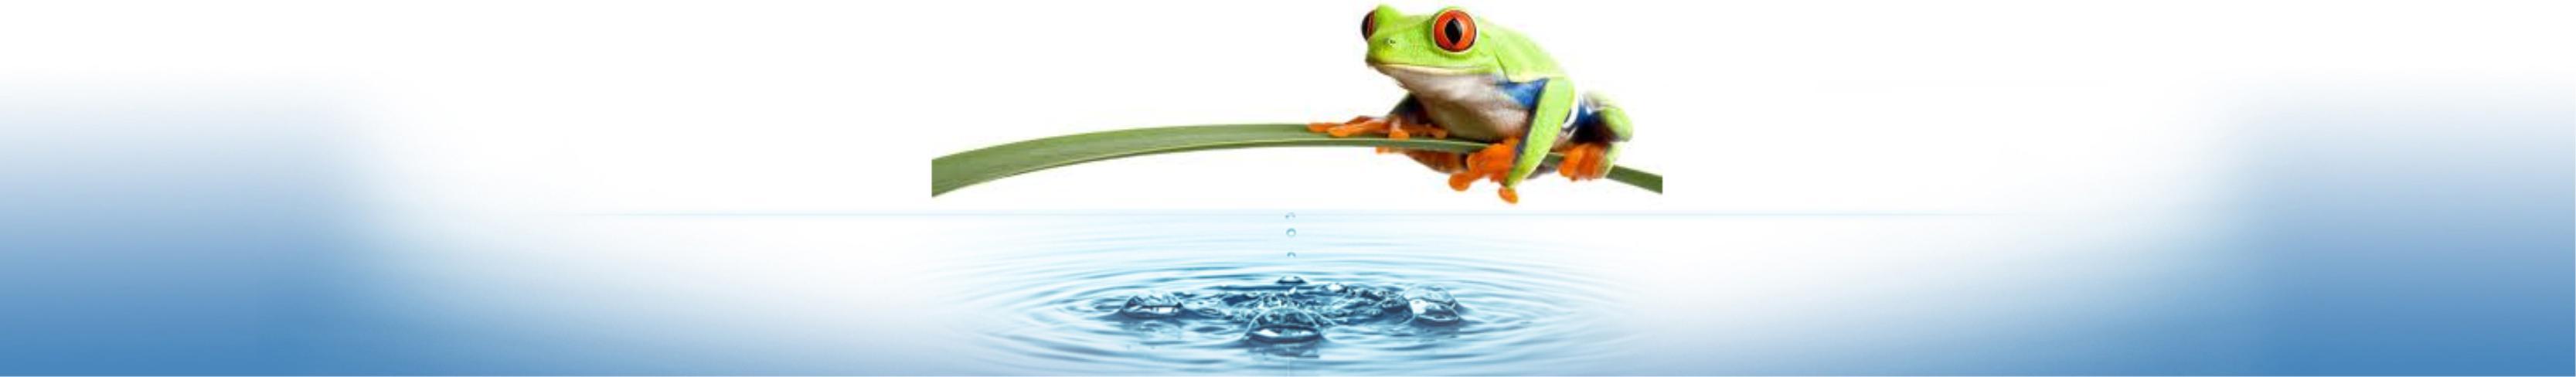 apt aqua pure ecology image